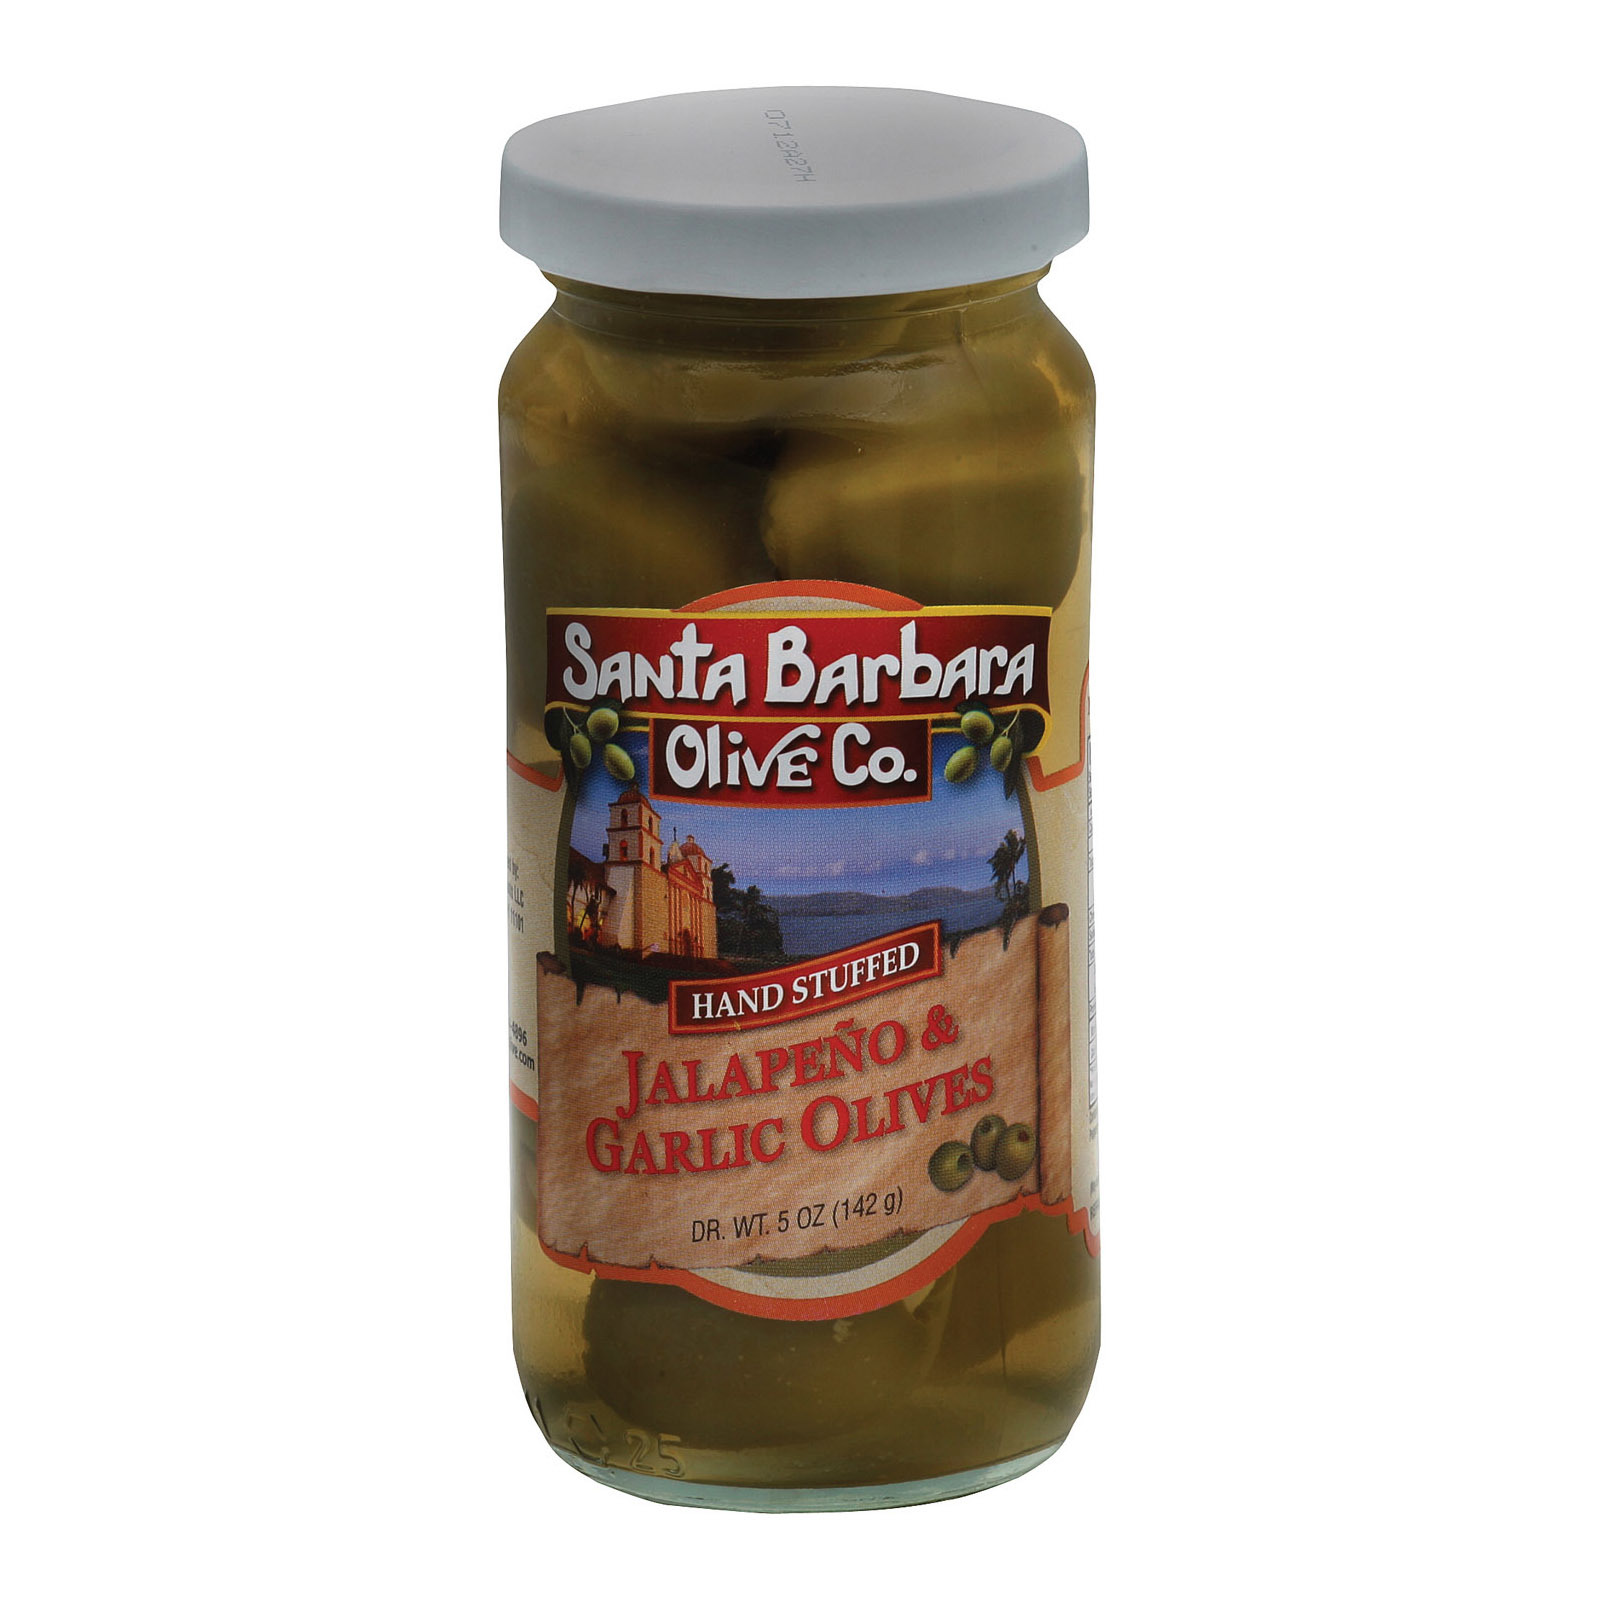 Santa Barbara Stuffed Olives - Garlic and Jalapeno Double Stuffed - Case of 6 - 5 oz.